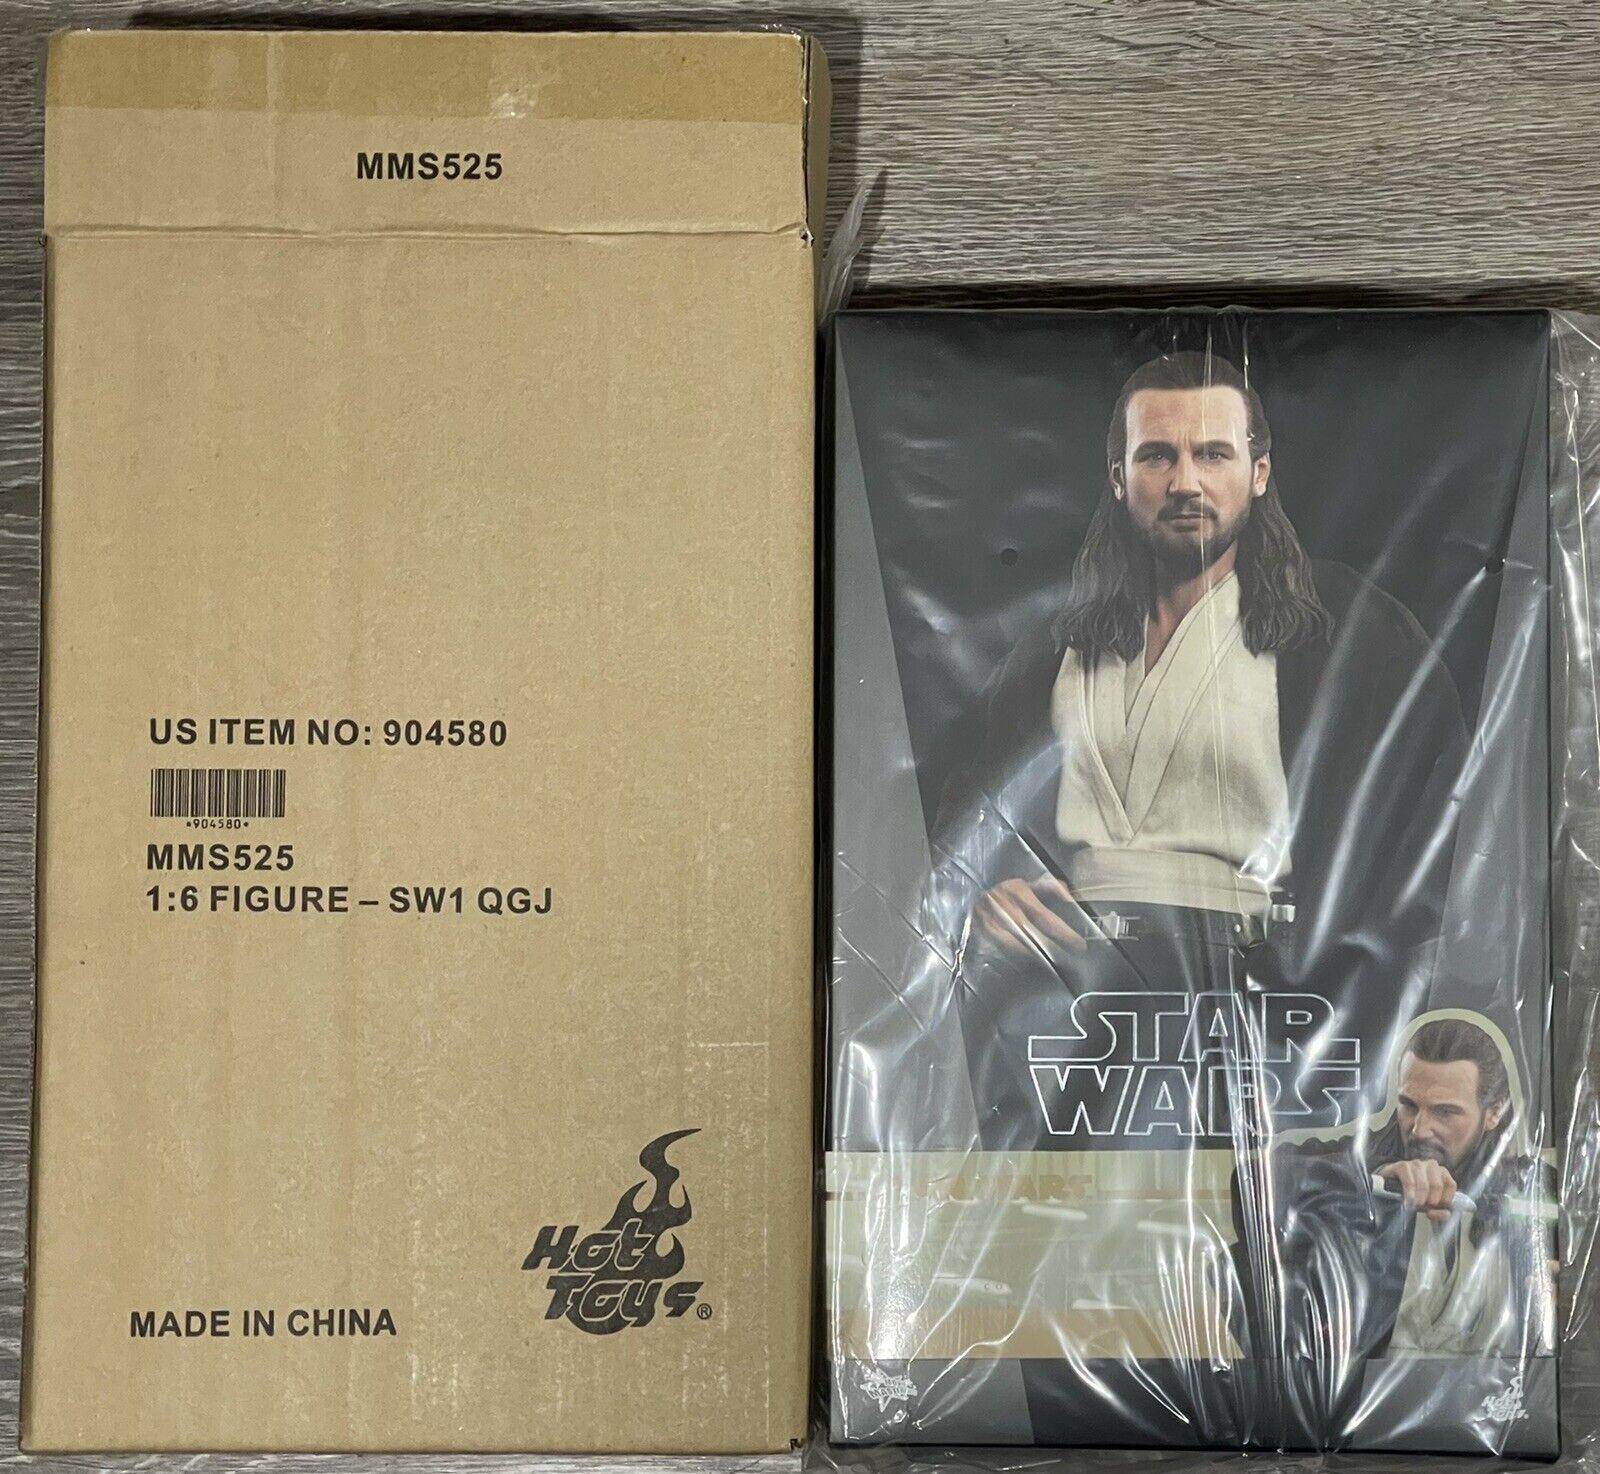 Hot Toys Star Wars QUI-GON JINN The Phantom Menace Figure 1/6 Scale MMS525 on eBay thumbnail